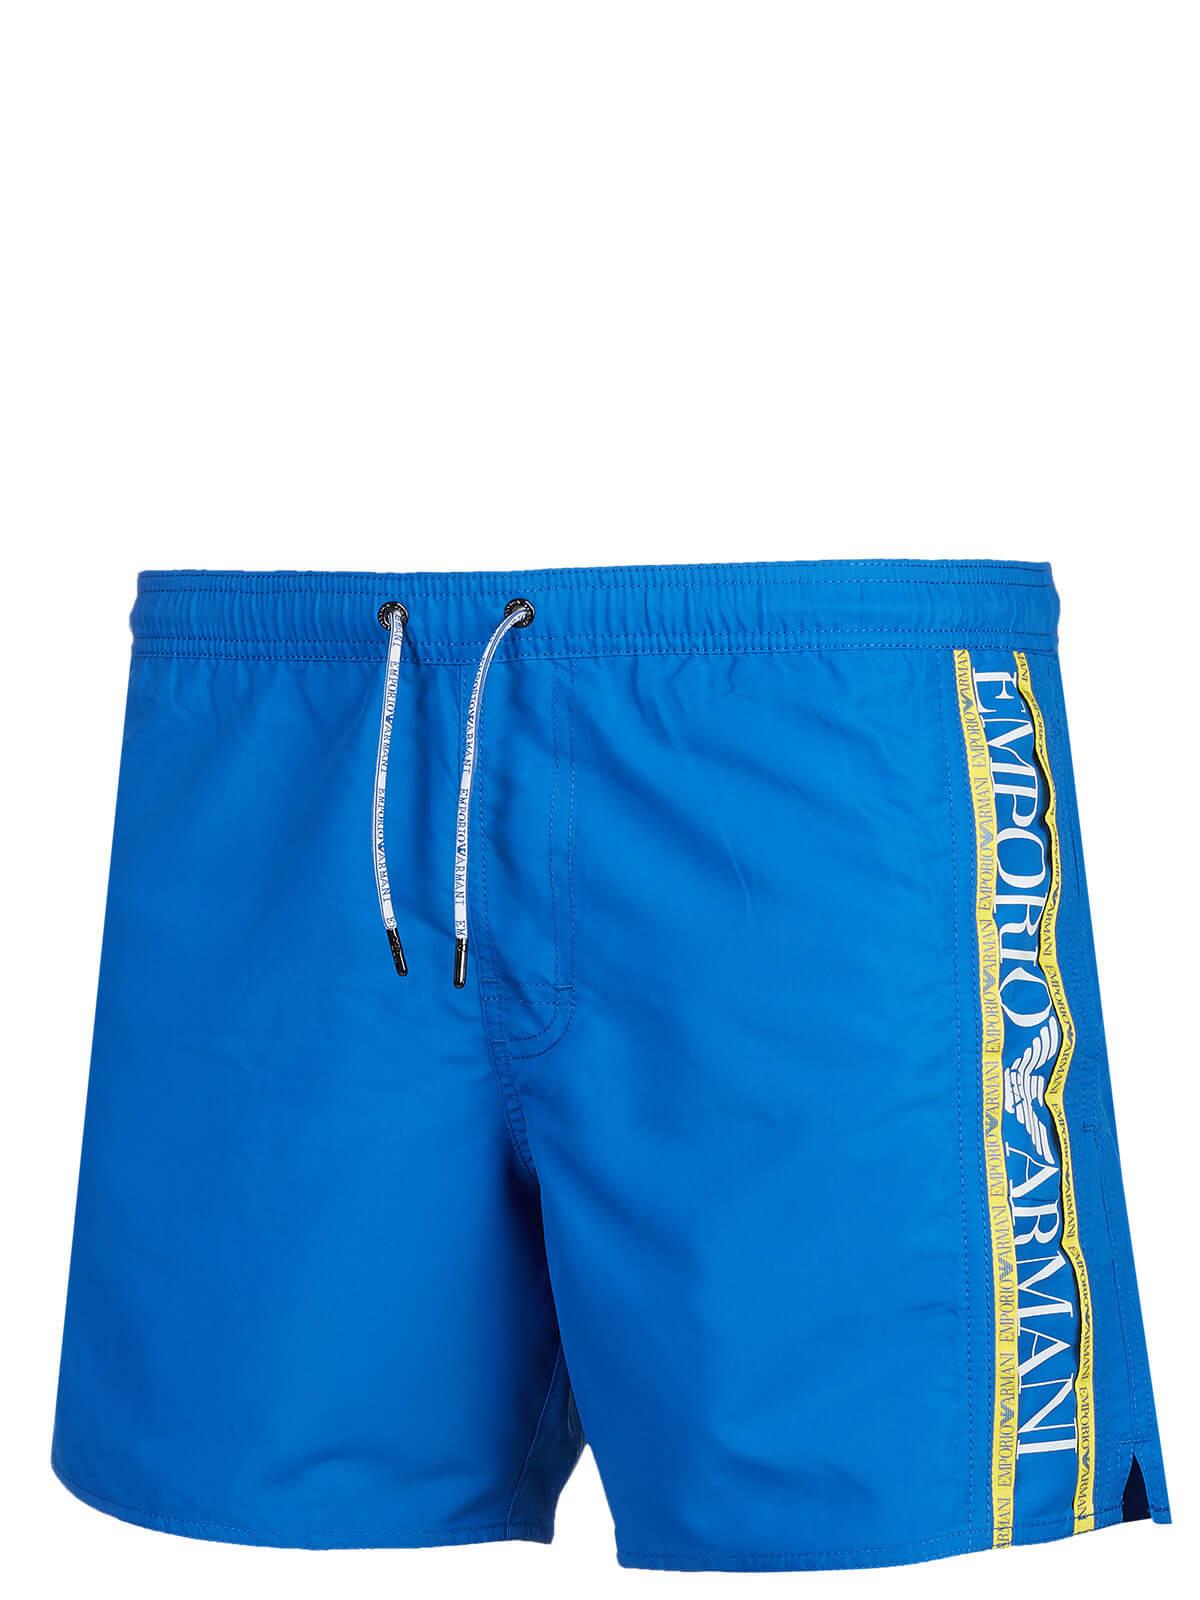 100% Qualitätsgarantie langlebig im einsatz UK-Shop Emporio Armani Badehose blau